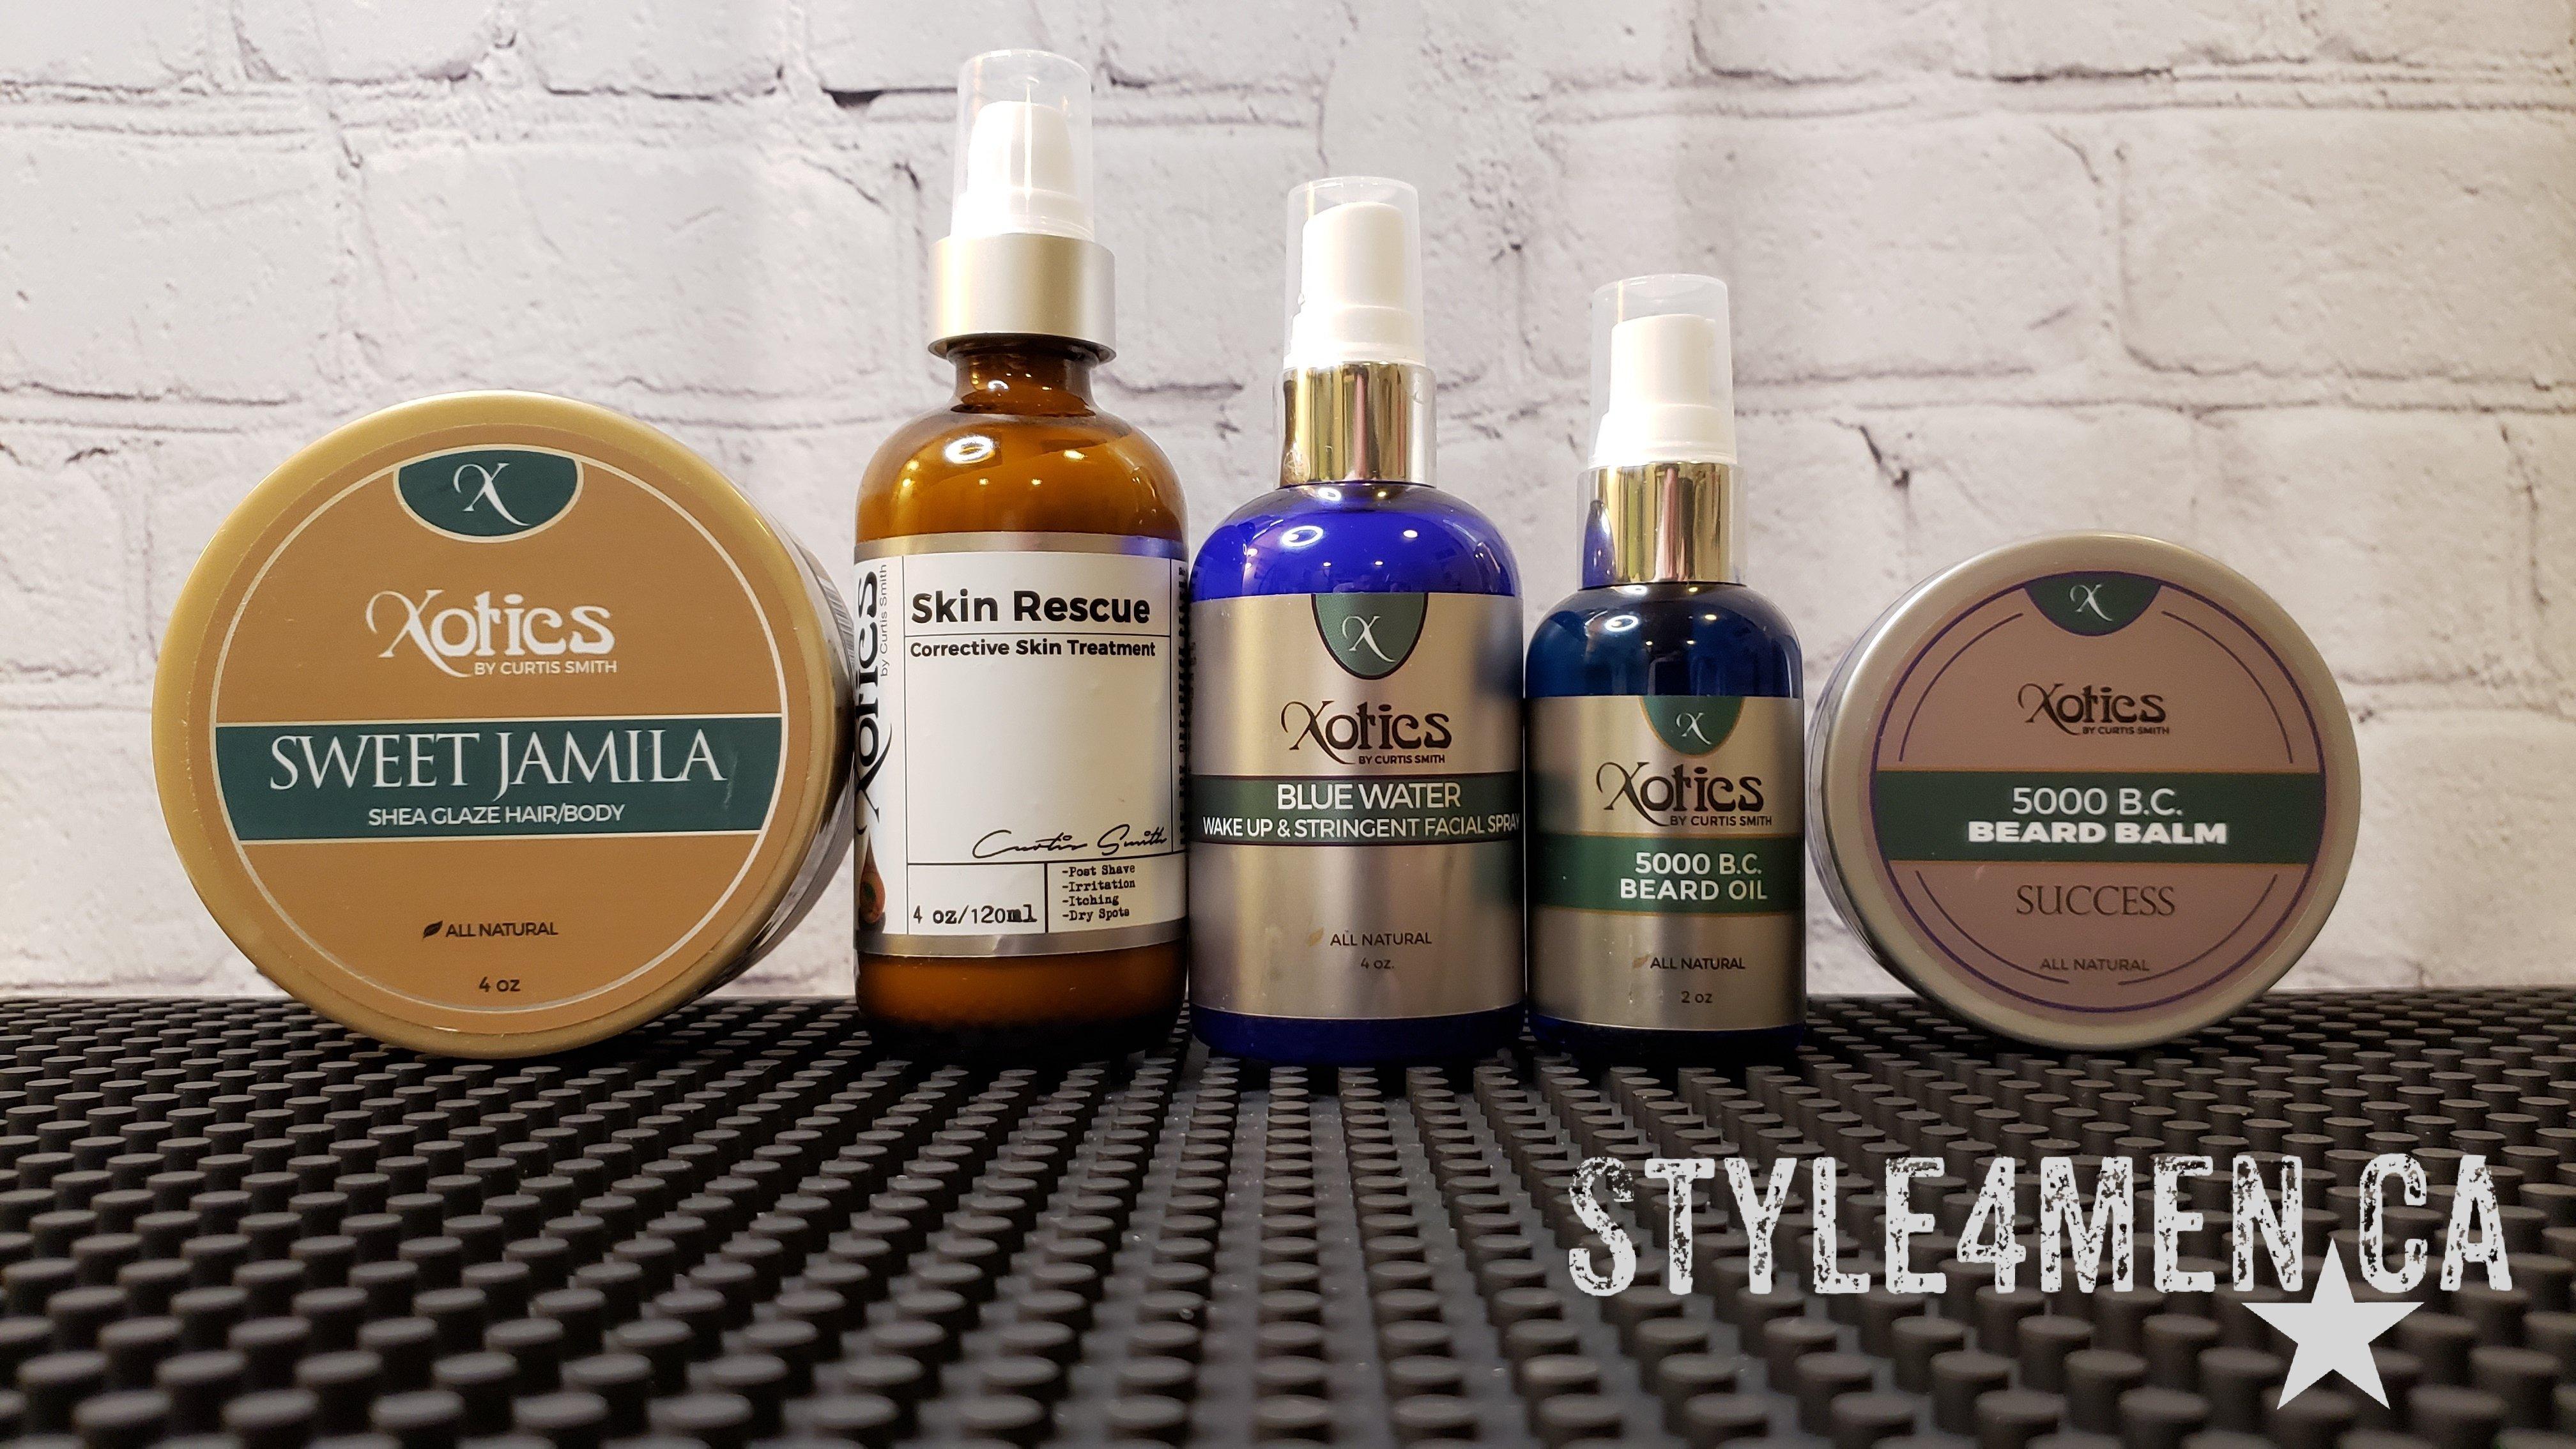 Xotics grooming essentials